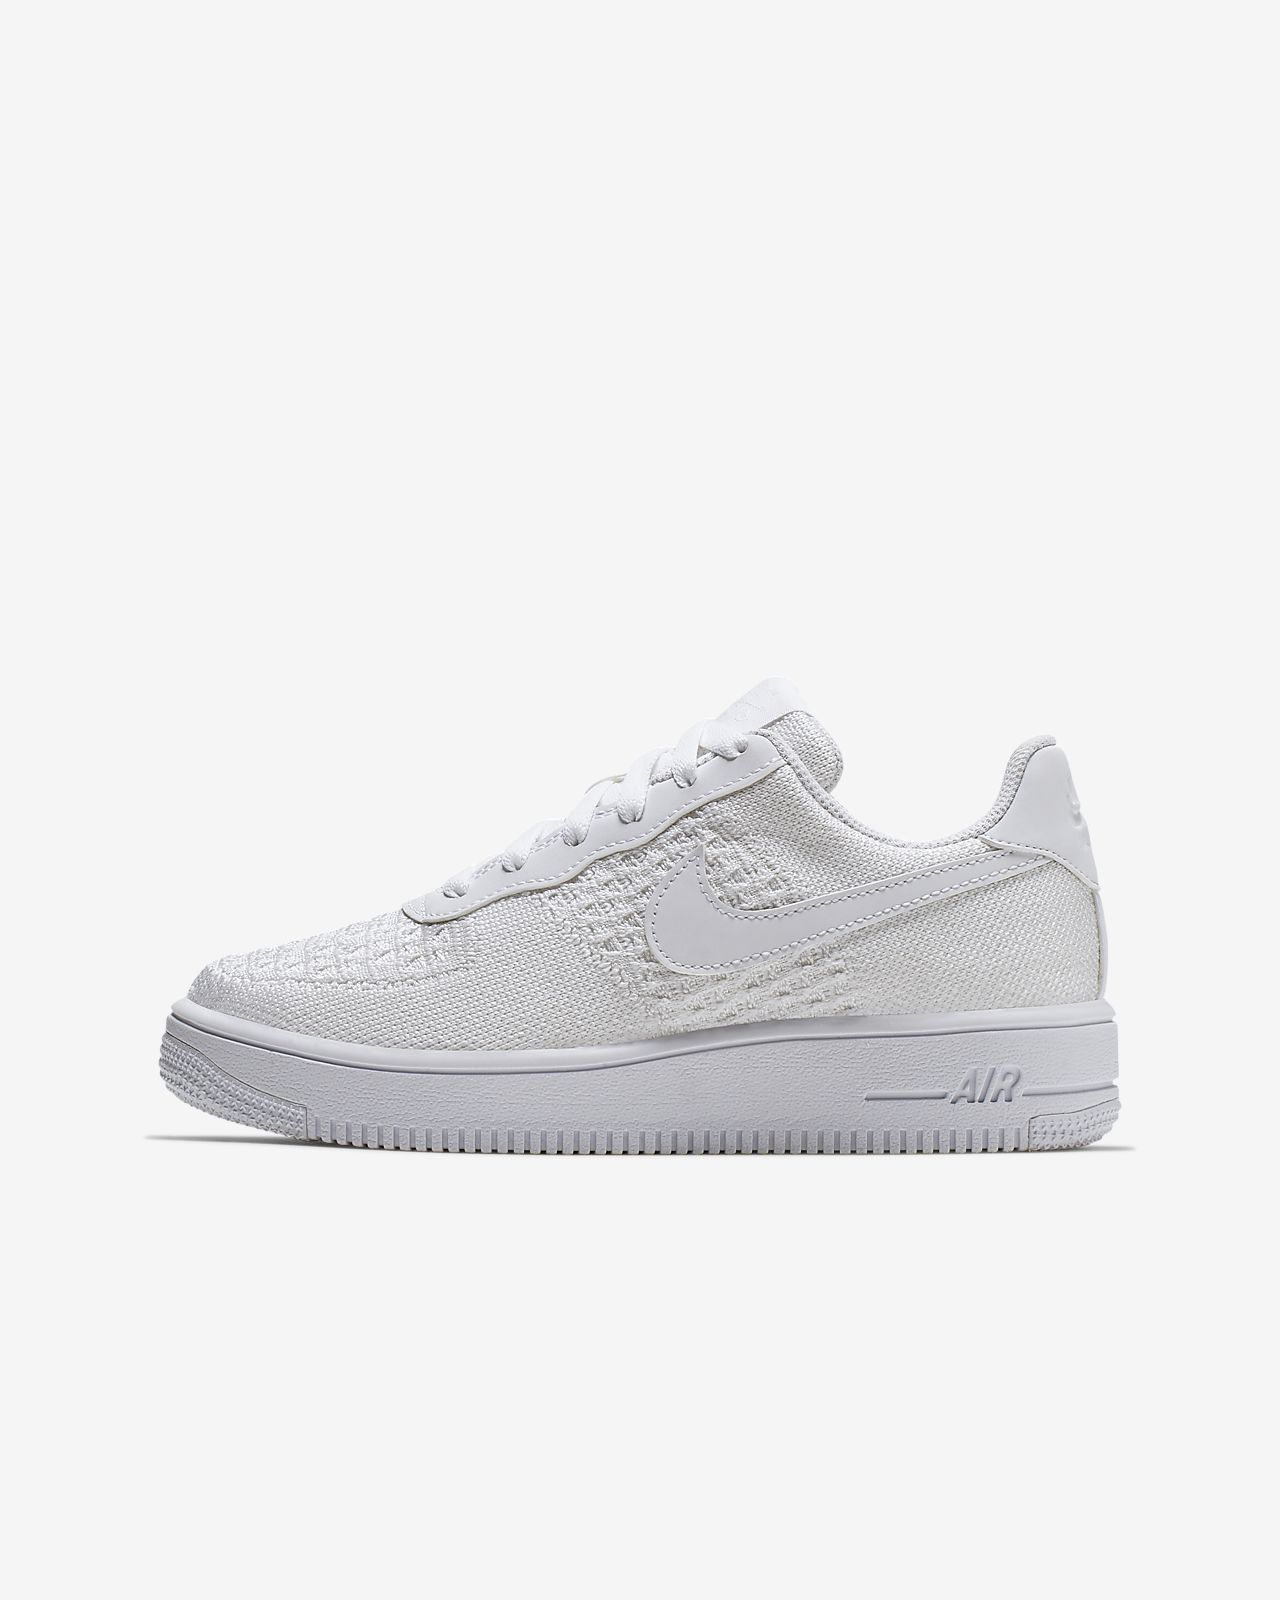 Nike Air Force 1 Flyknit 2.0 Schuh für jüngereältere Kinder